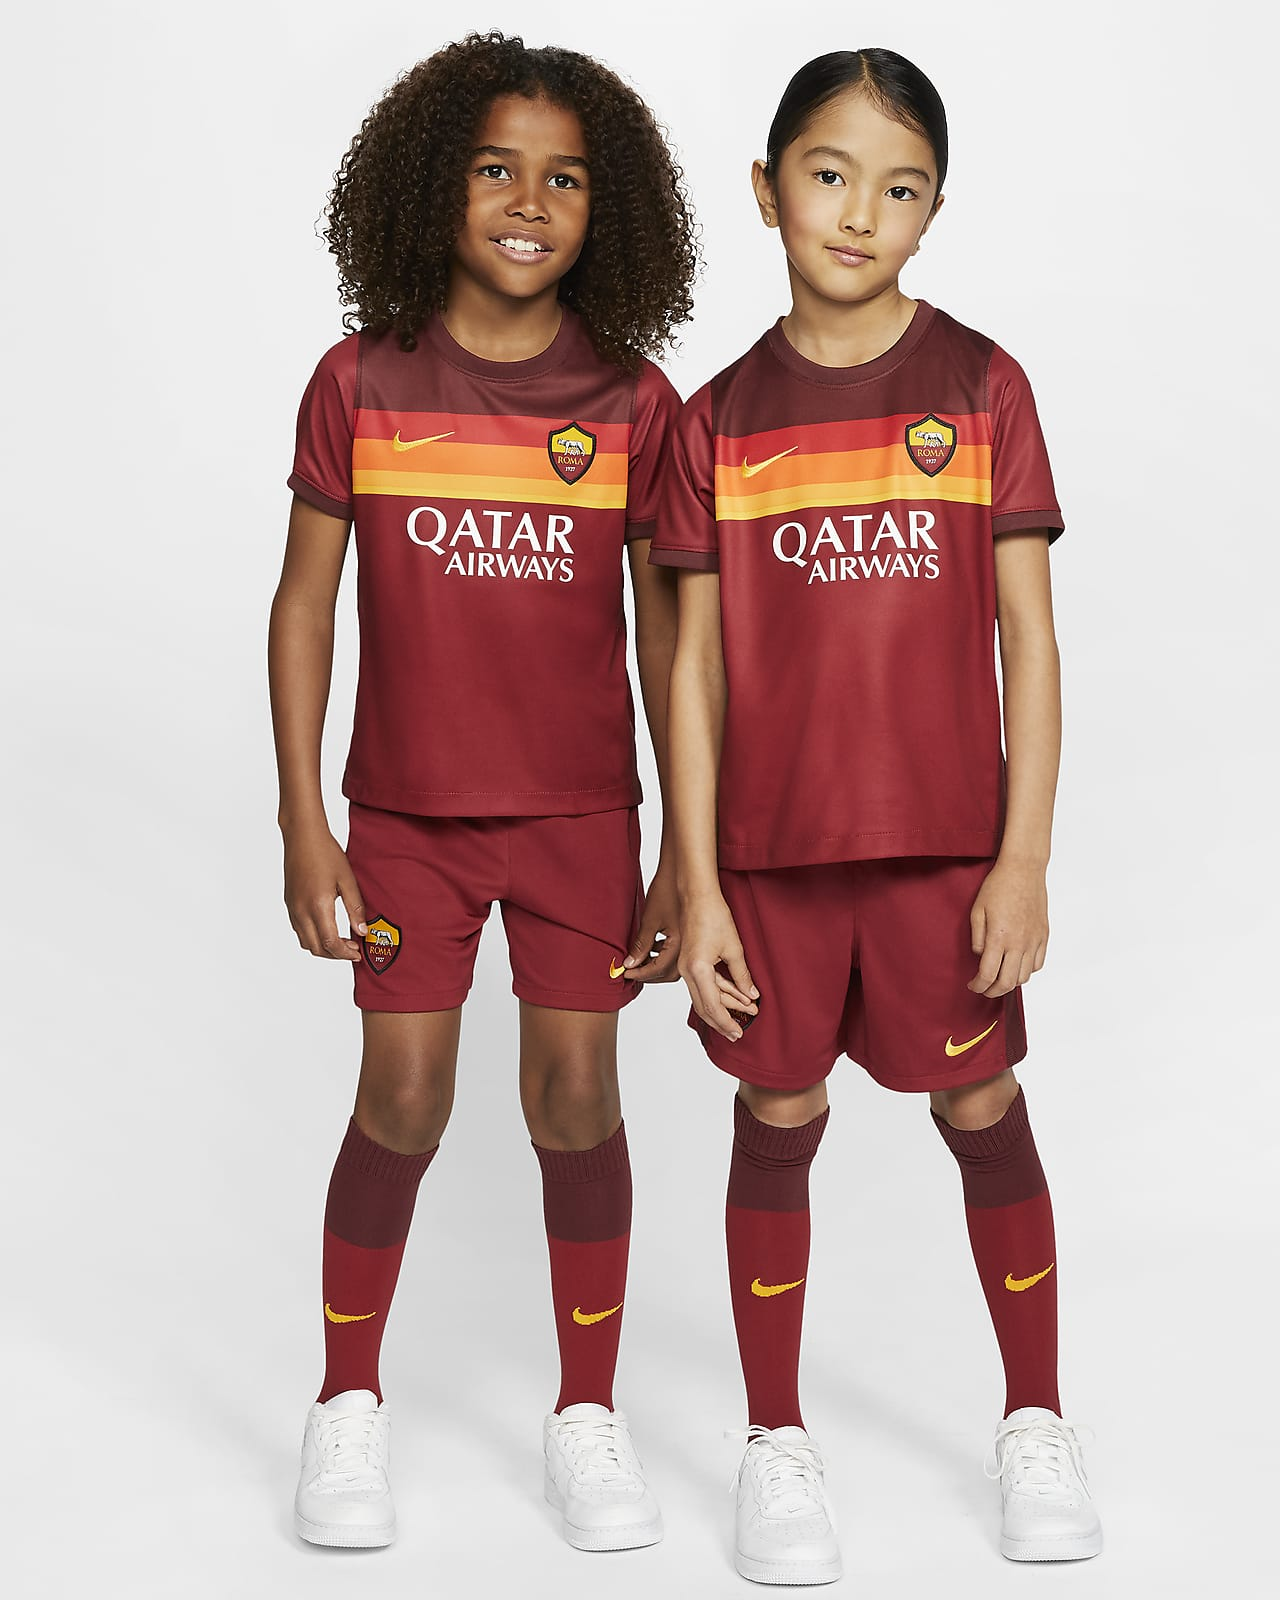 A.S. Roma 2020/21 İç Saha Küçük Çocuk Futbol Forması